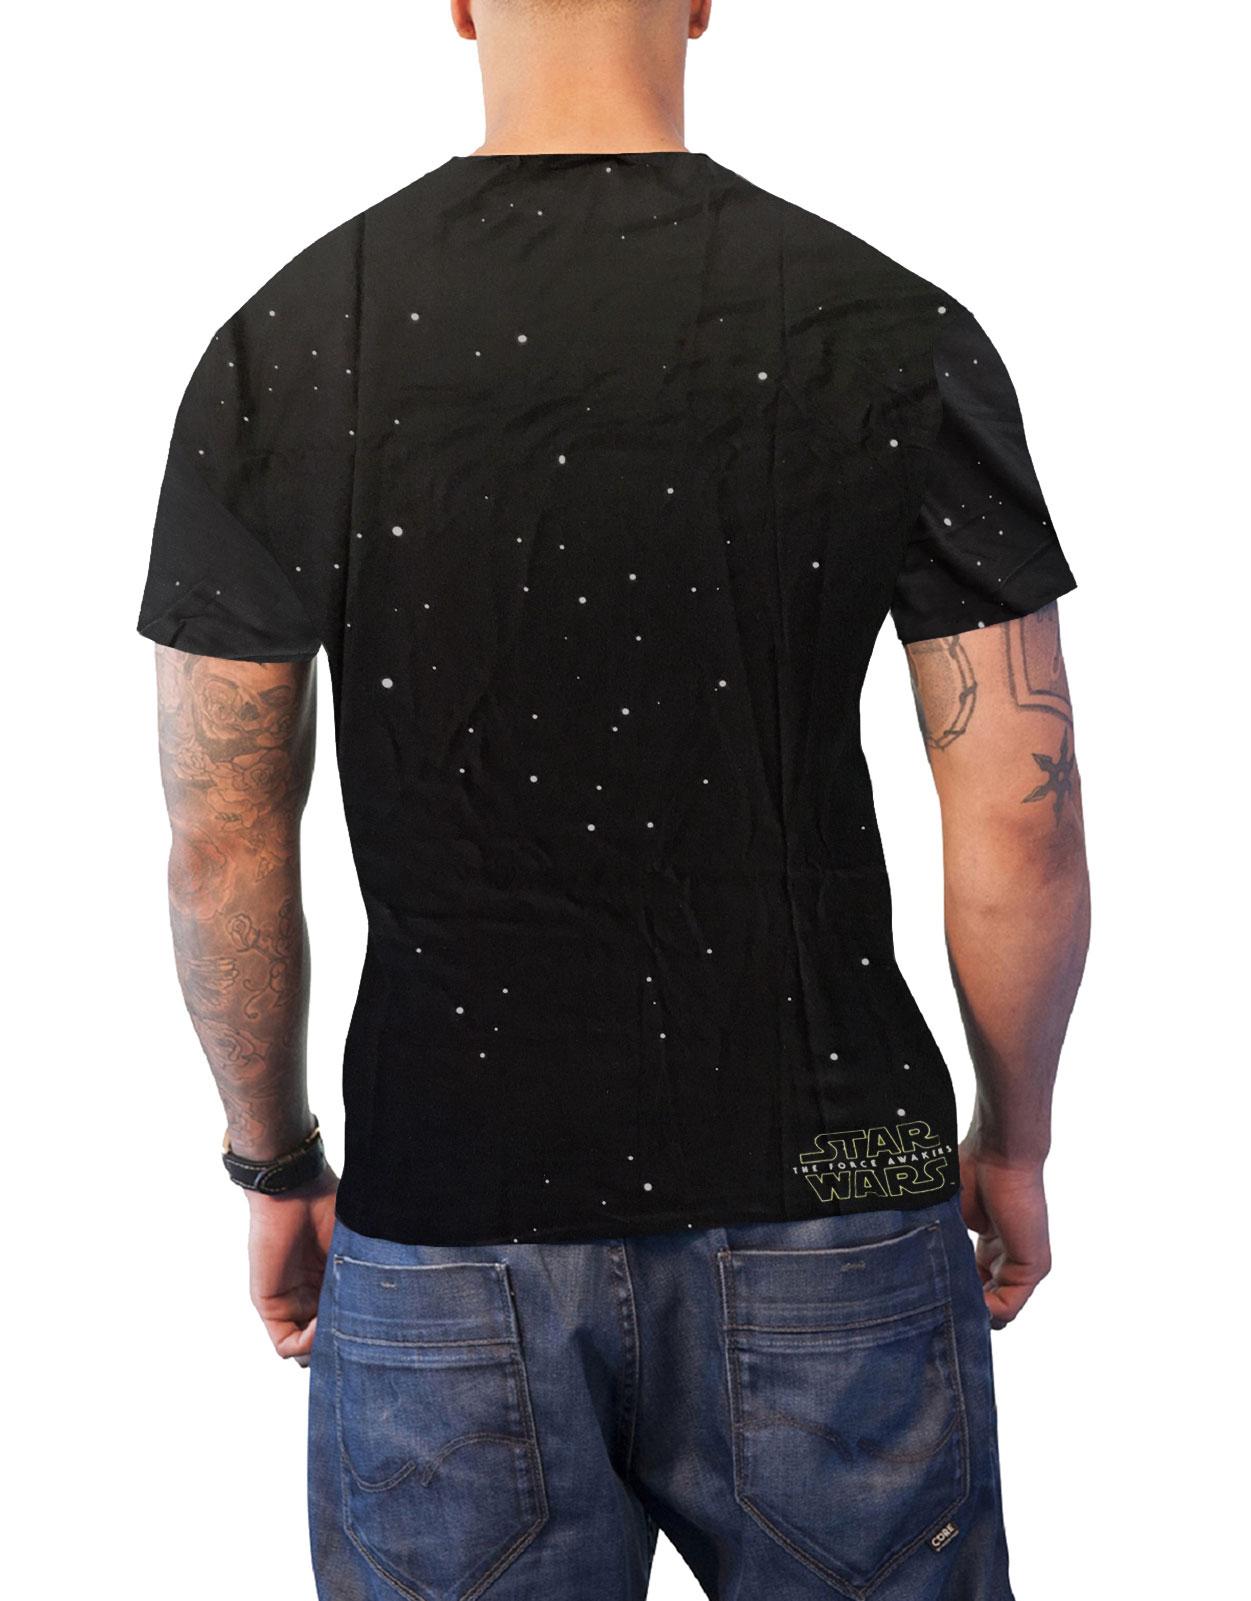 Star-Wars-Camiseta-Para-Hombres-Regreso-del-Jedi-R2D2-Luke-Leia-oficial-nuevo miniatura 3